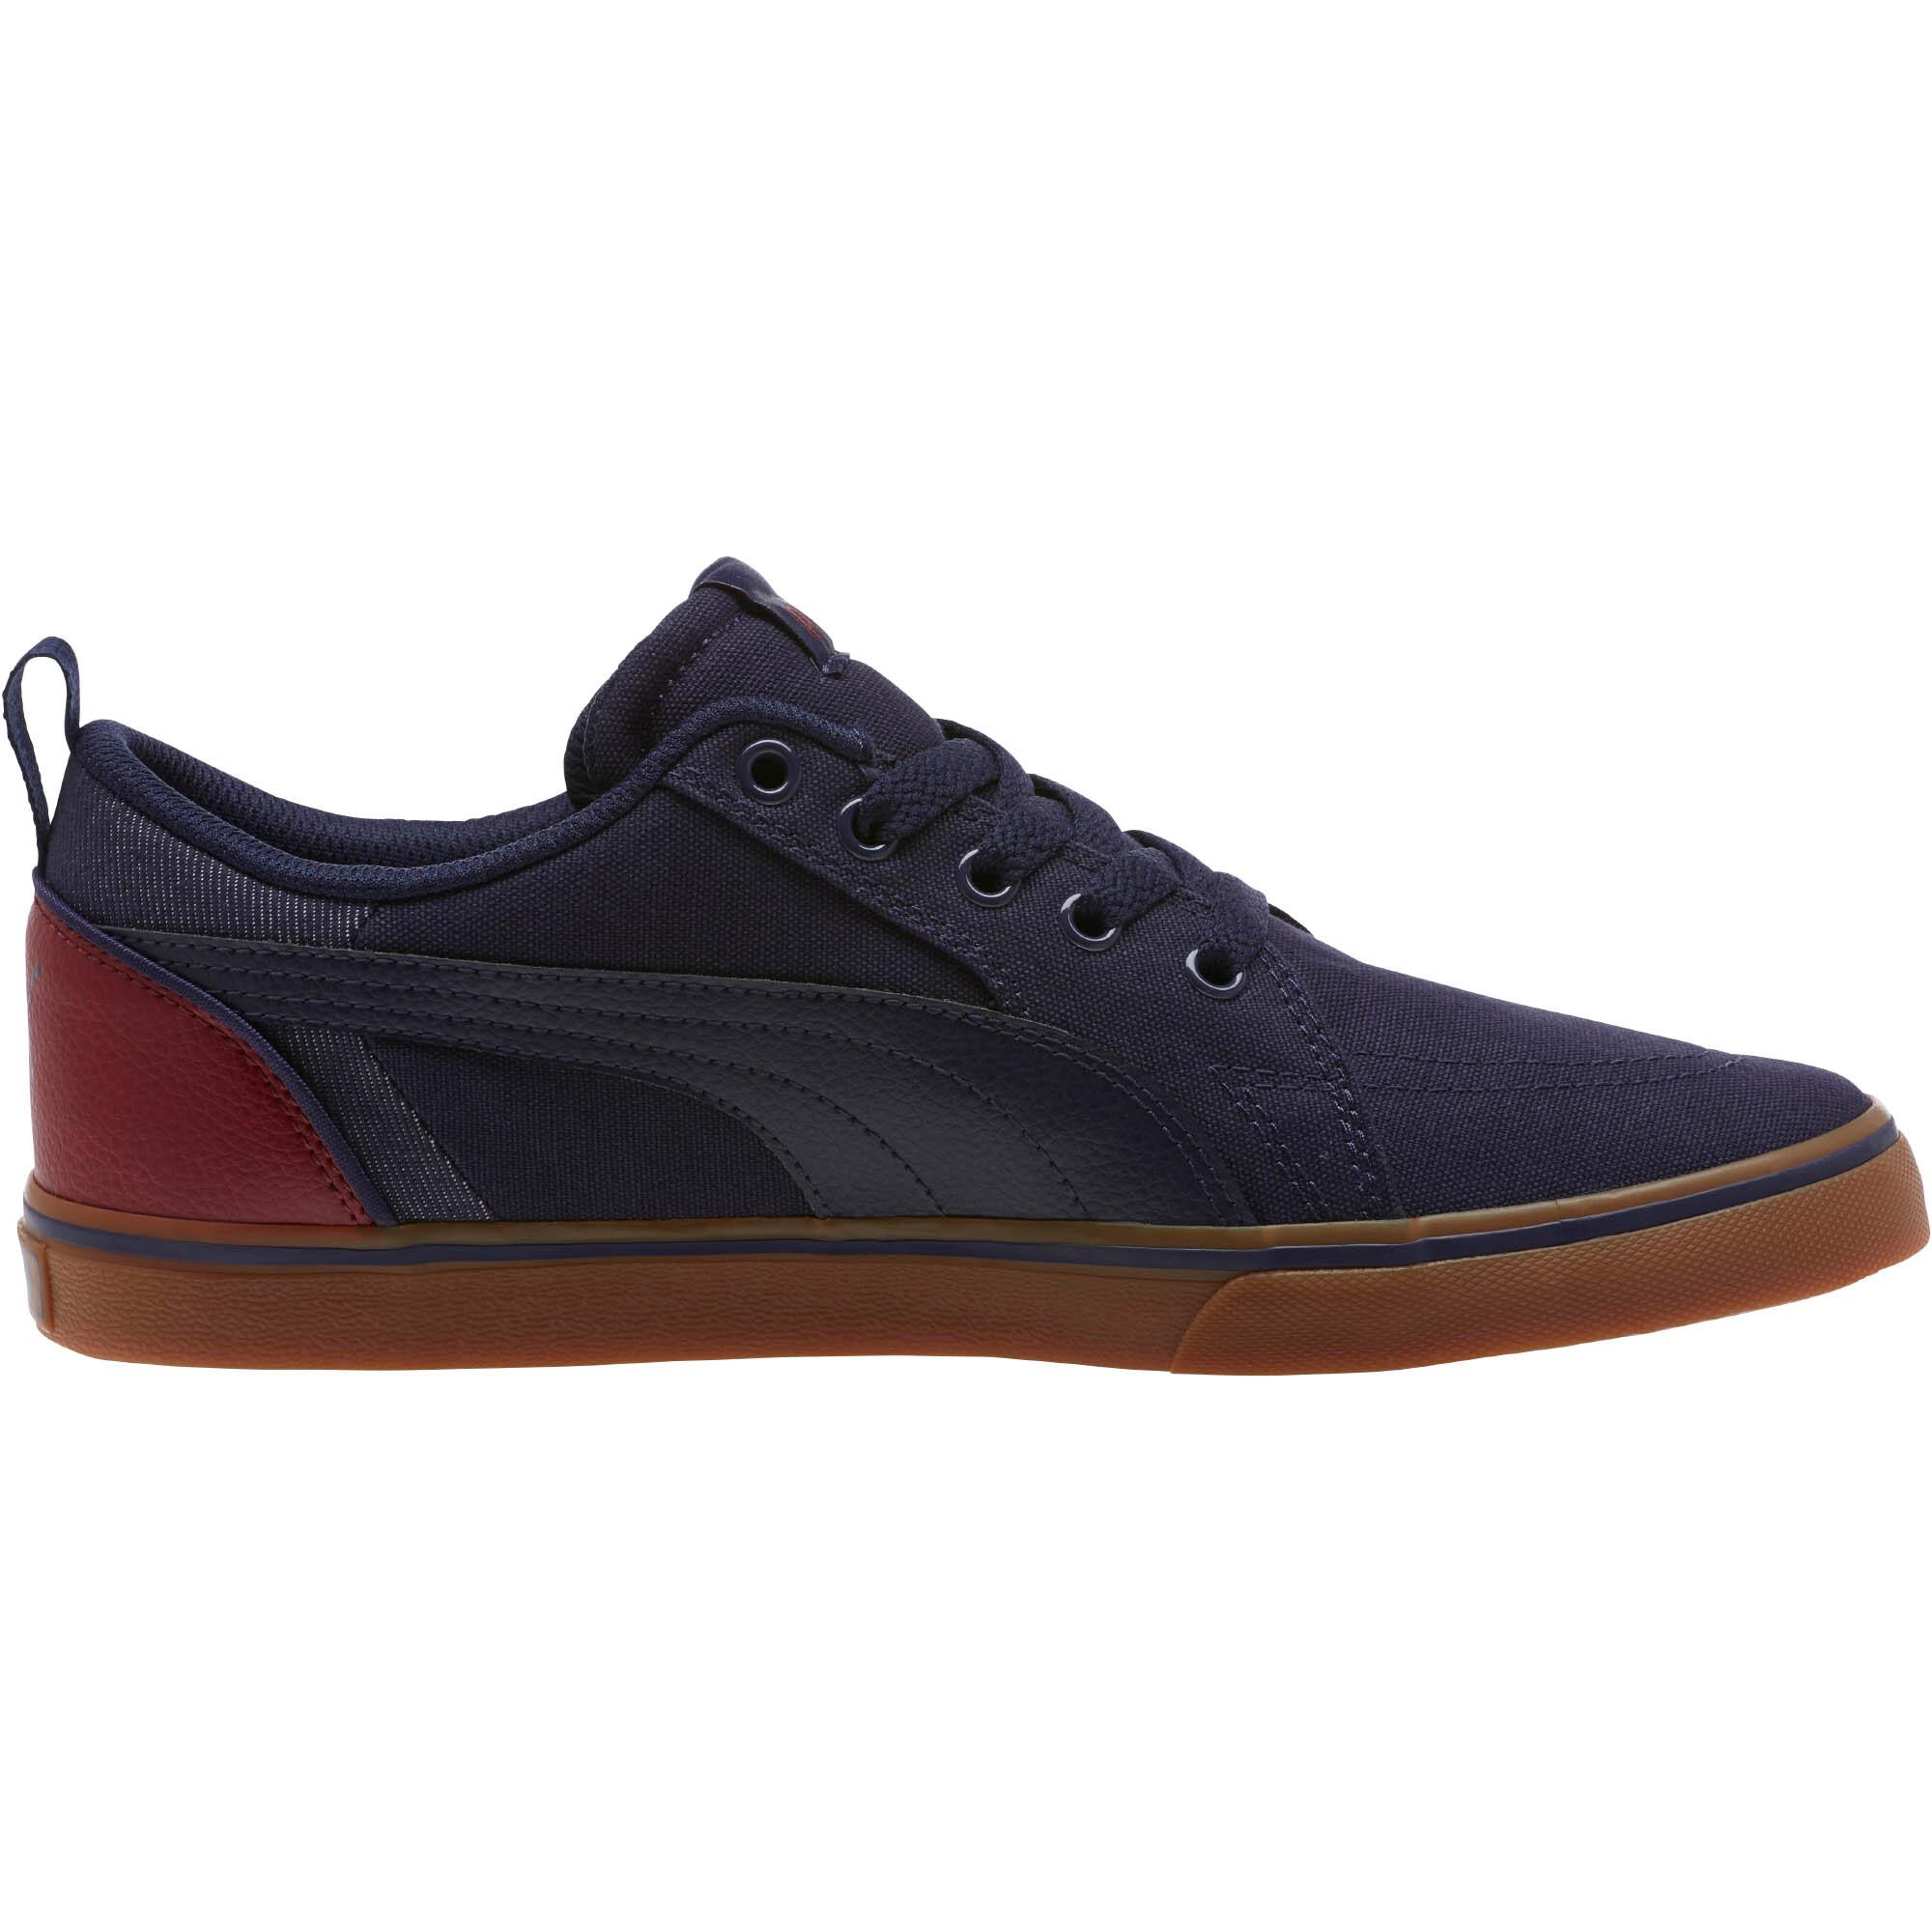 PUMA-PUMA-Bridger-Men-039-s-Sneakers-Men-Shoe-Basics thumbnail 16